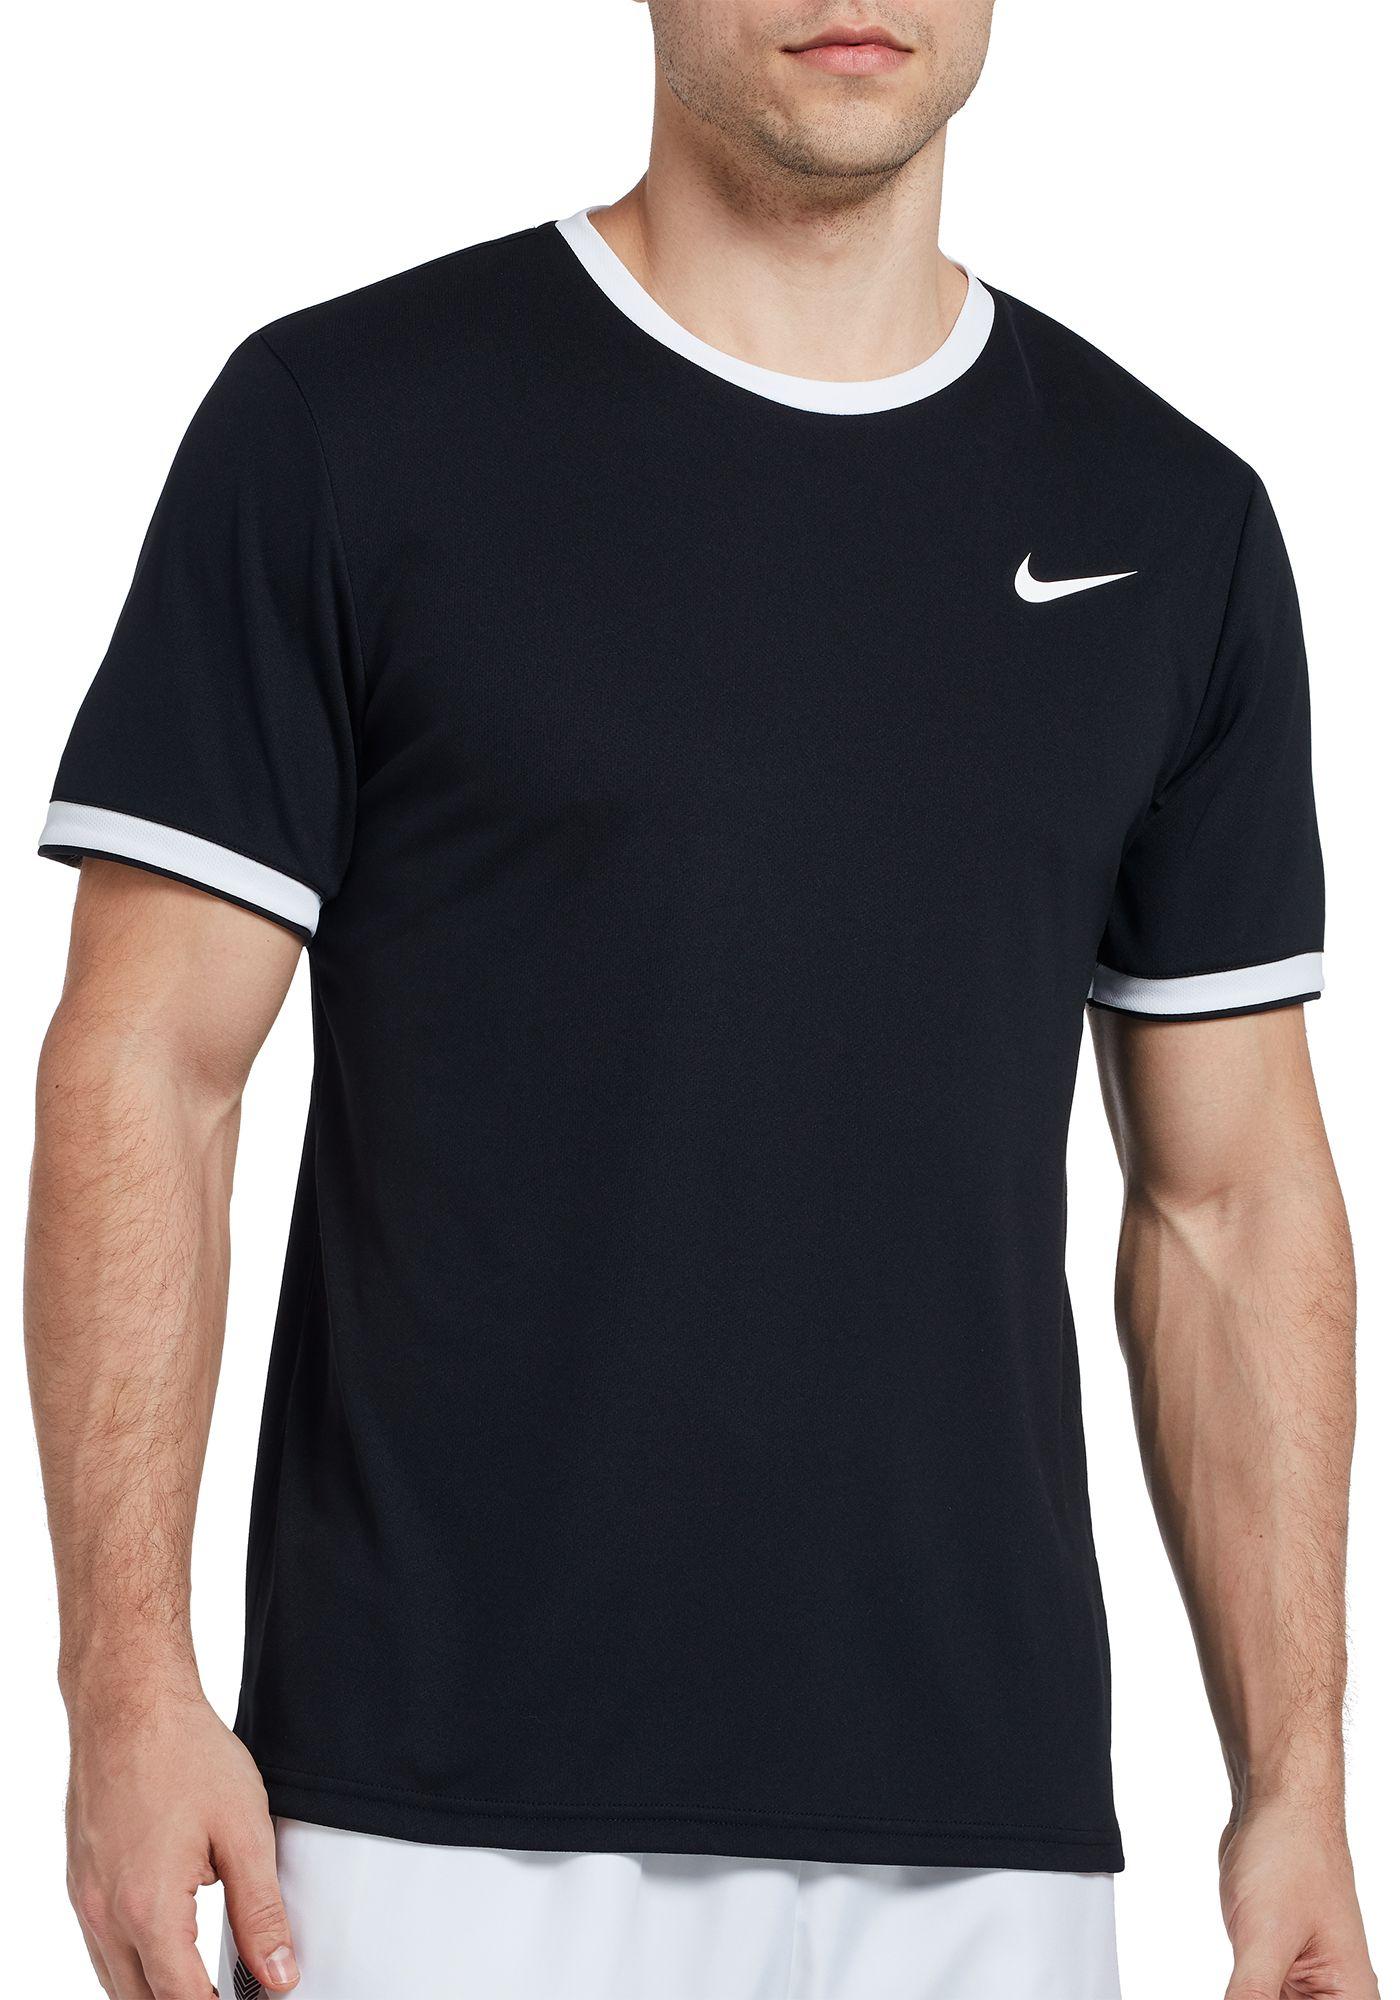 Nike Men's Court Dry Tennis Shirt